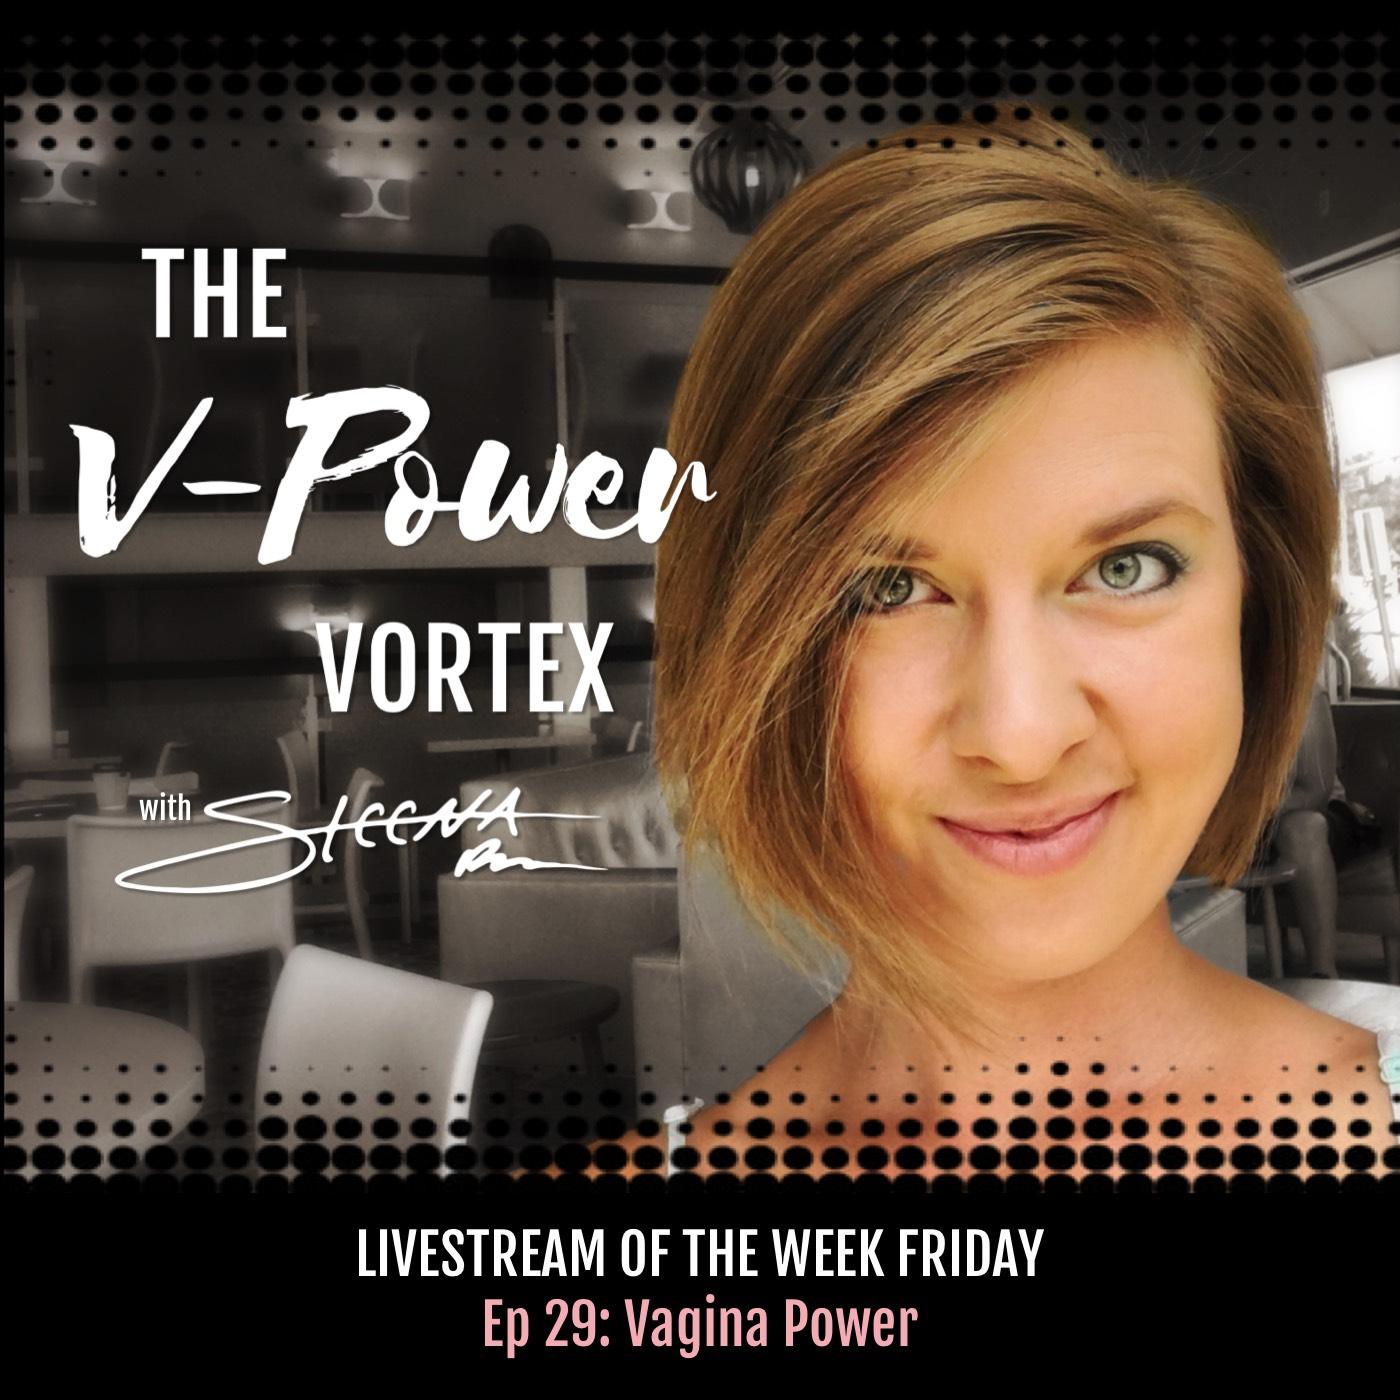 Ep 29 Vagina Power - Livestream of the Week Friday.jpeg